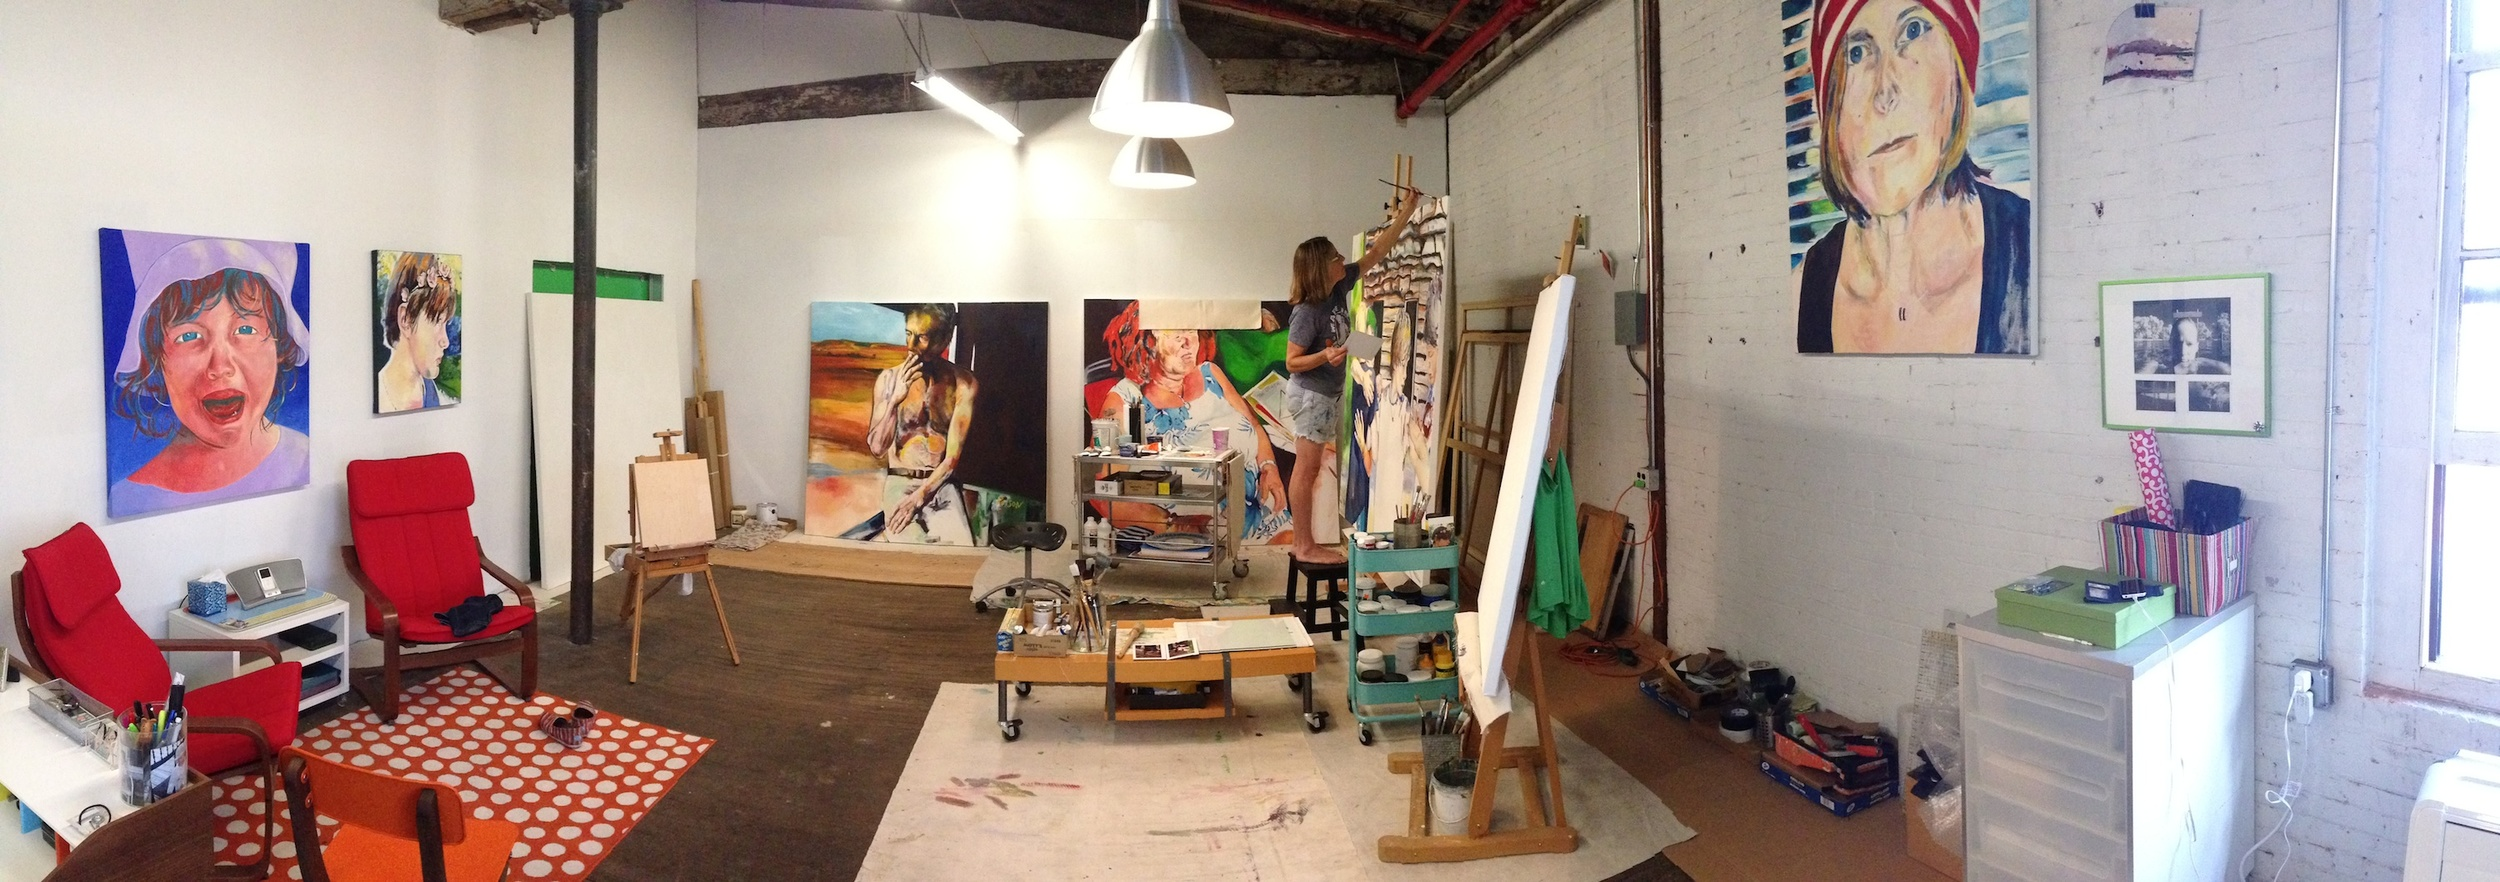 Jean in her studio at Garner Arts Center, Garnerville, NY